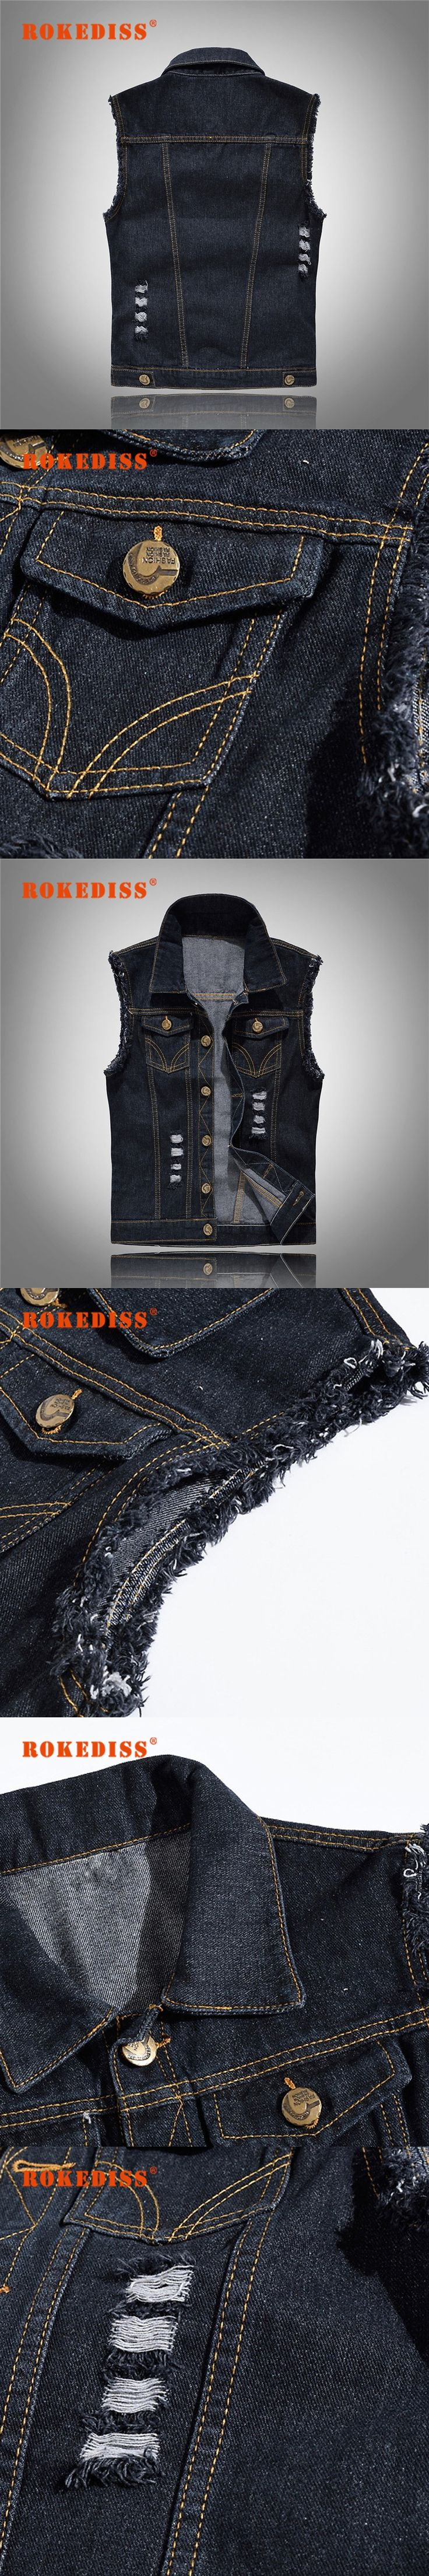 Vintage Design Men's Denim Vest Male Black Color Slim Fit Sleeveless Jackets Men Hole Jeans Brand Waistcoat  S-6XL G292